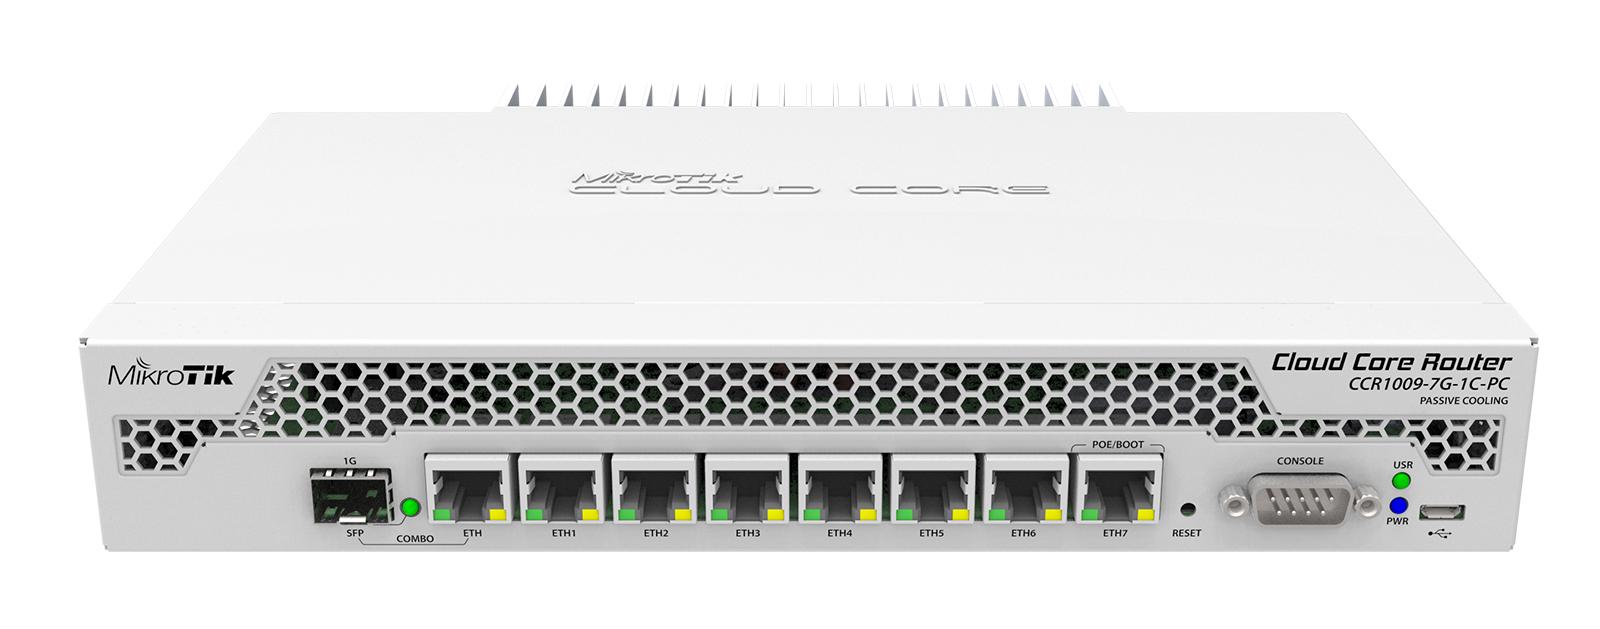 Mikrotik Routerboard Rb1100ahx2 Cloudcorerouter Ccr1009 7g 1c Pc 7x Ge 1x Combo Usb